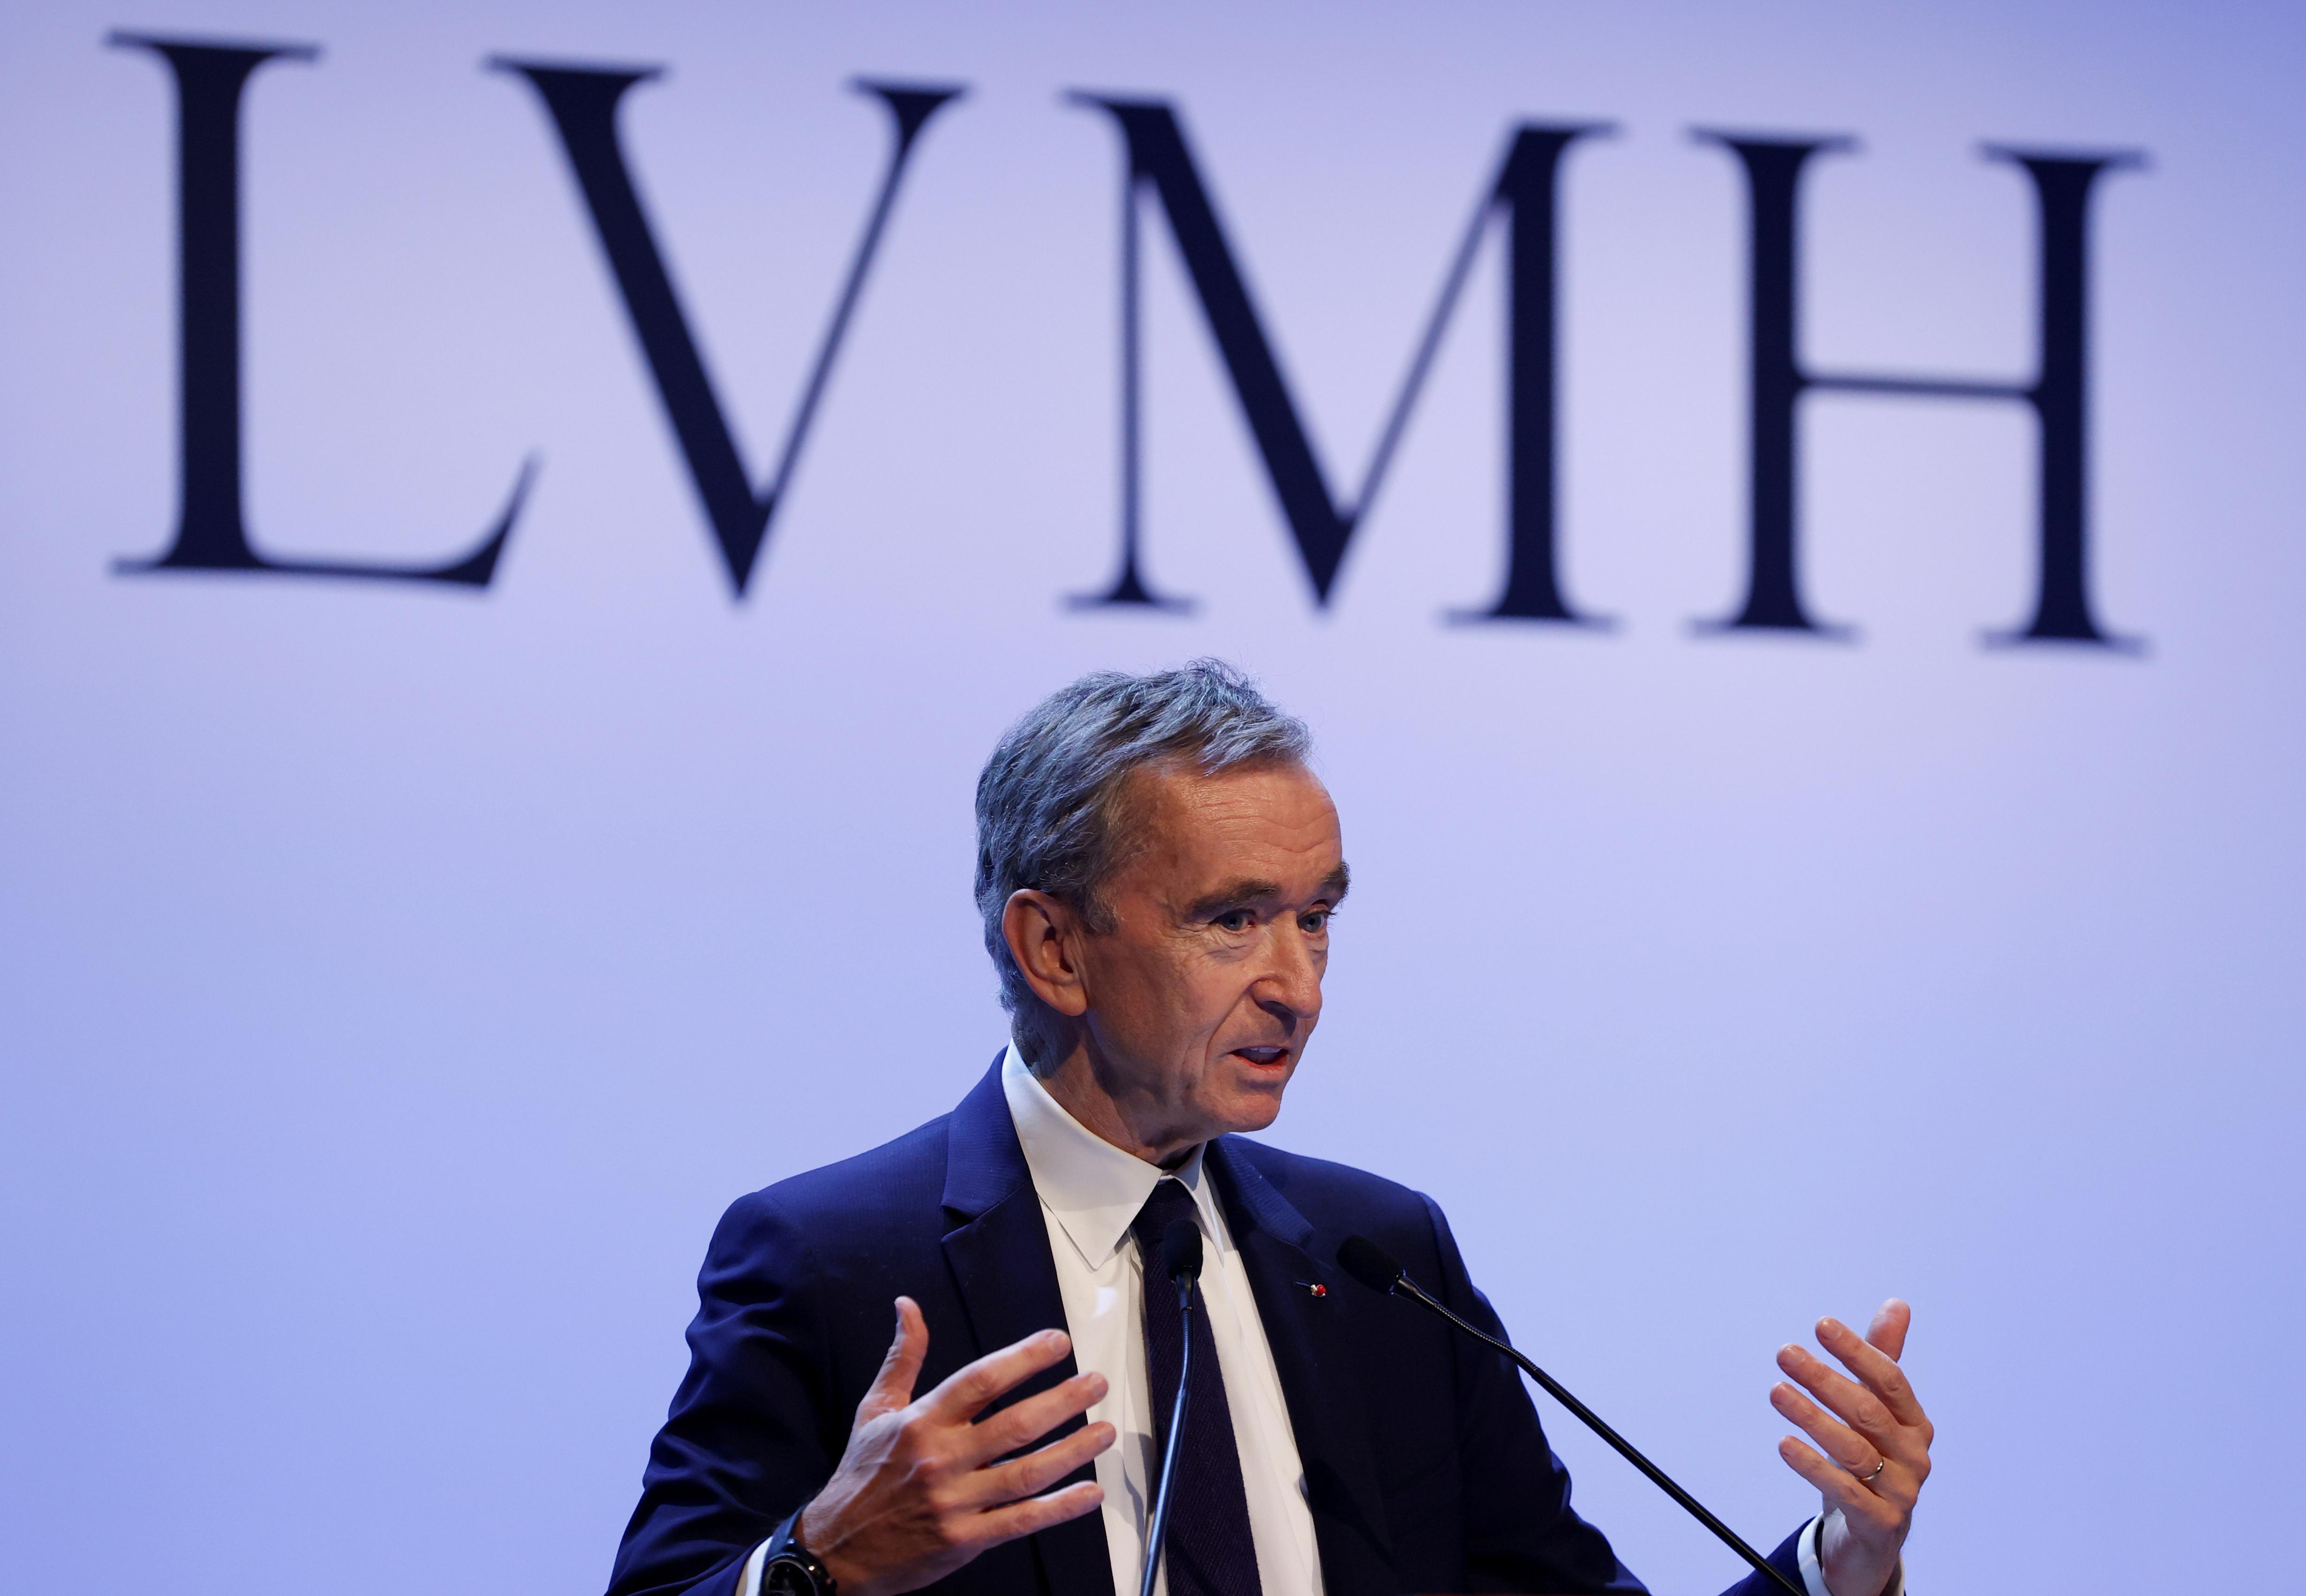 LVMH luxury group Chief Executive Bernard Arnault announces their 2019 results in Paris, France, January 28, 2020. REUTERS/Christian Hartmann